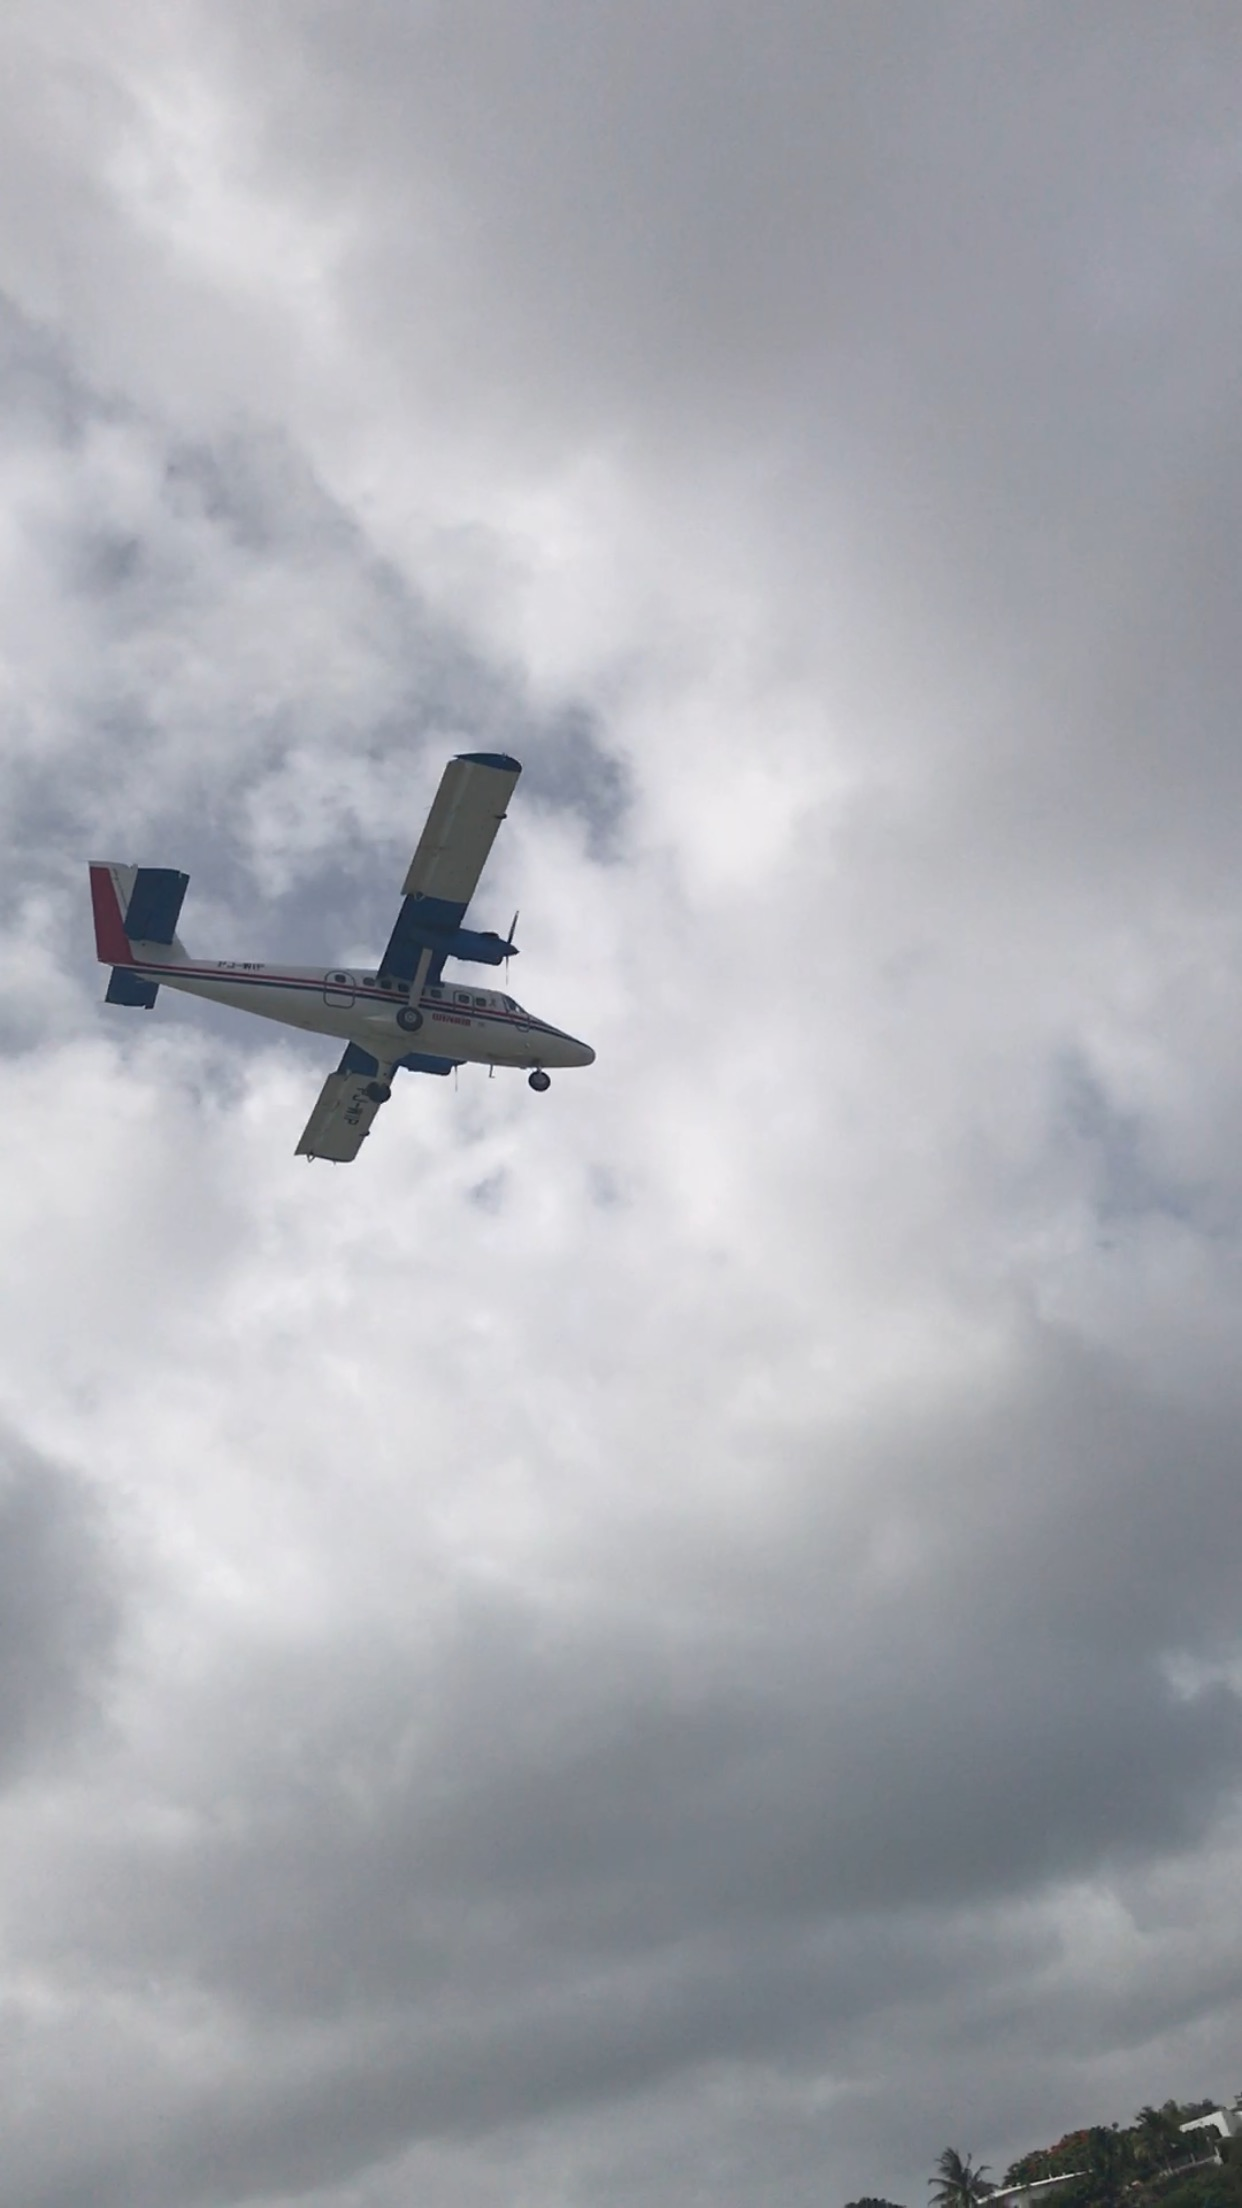 Plane St Martin Caribbean Sea Vacation